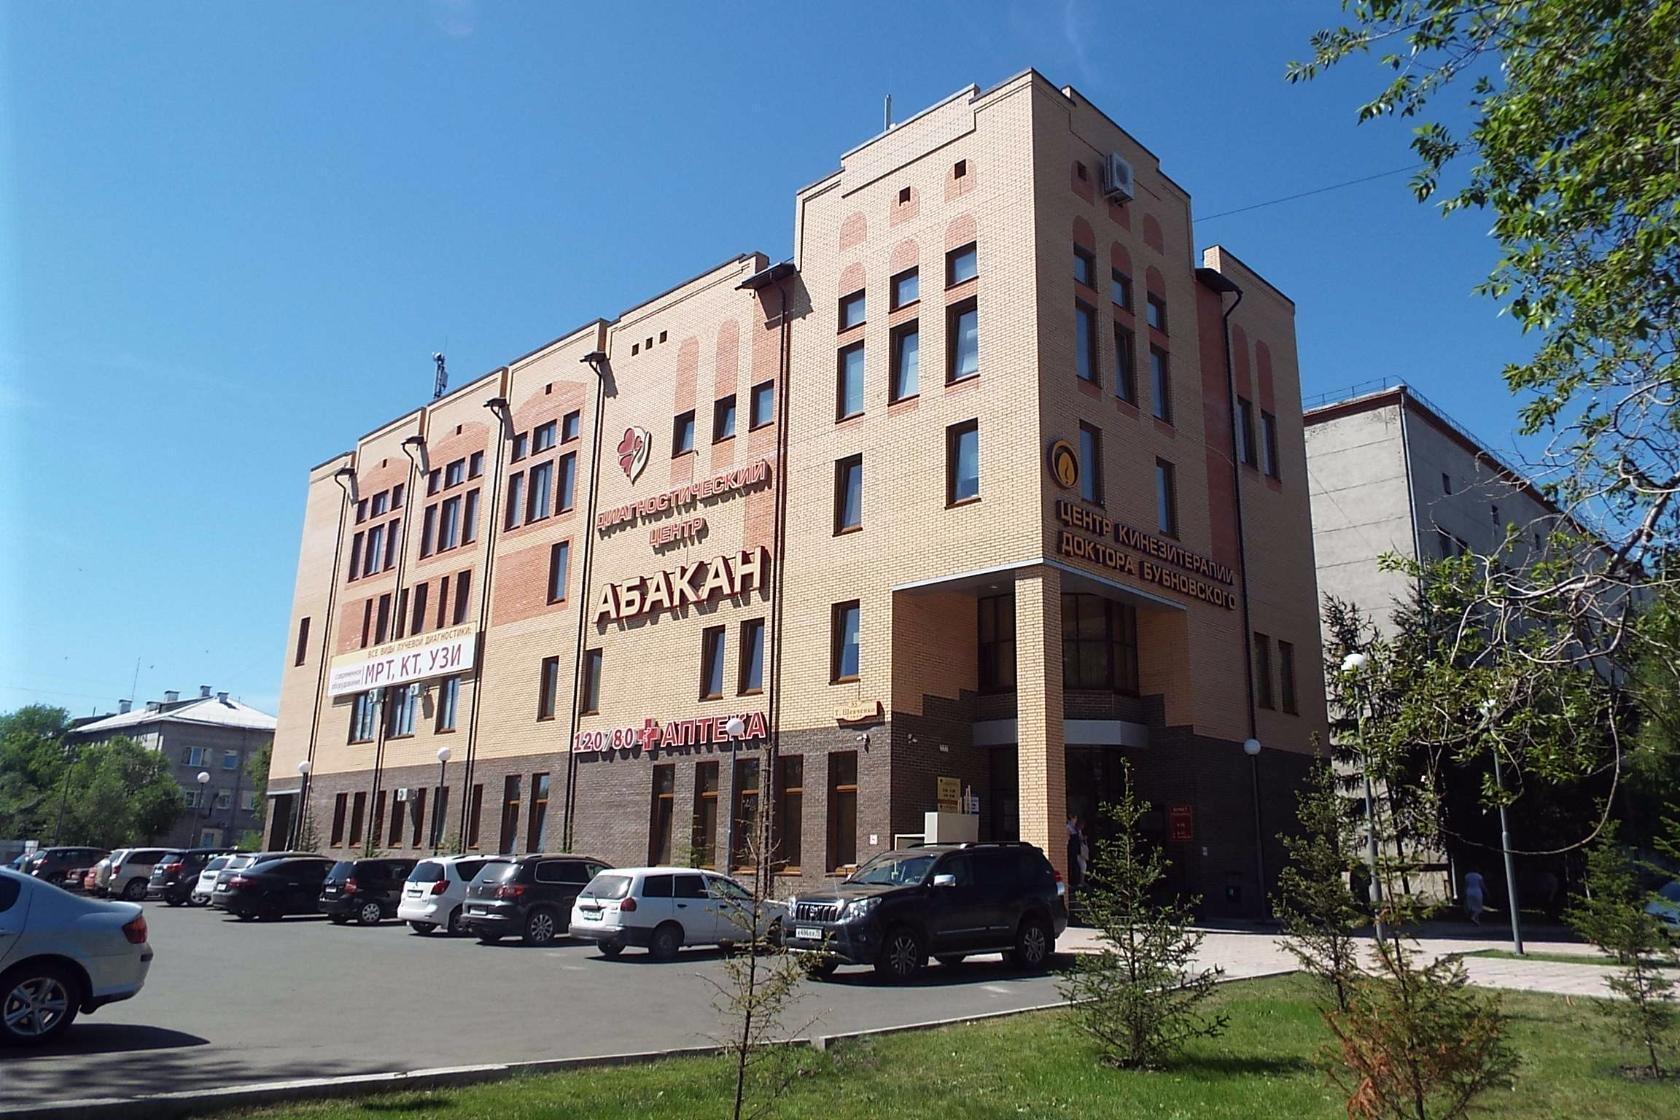 фотография Диагностического центра Абакан на улице Тараса Шевченко